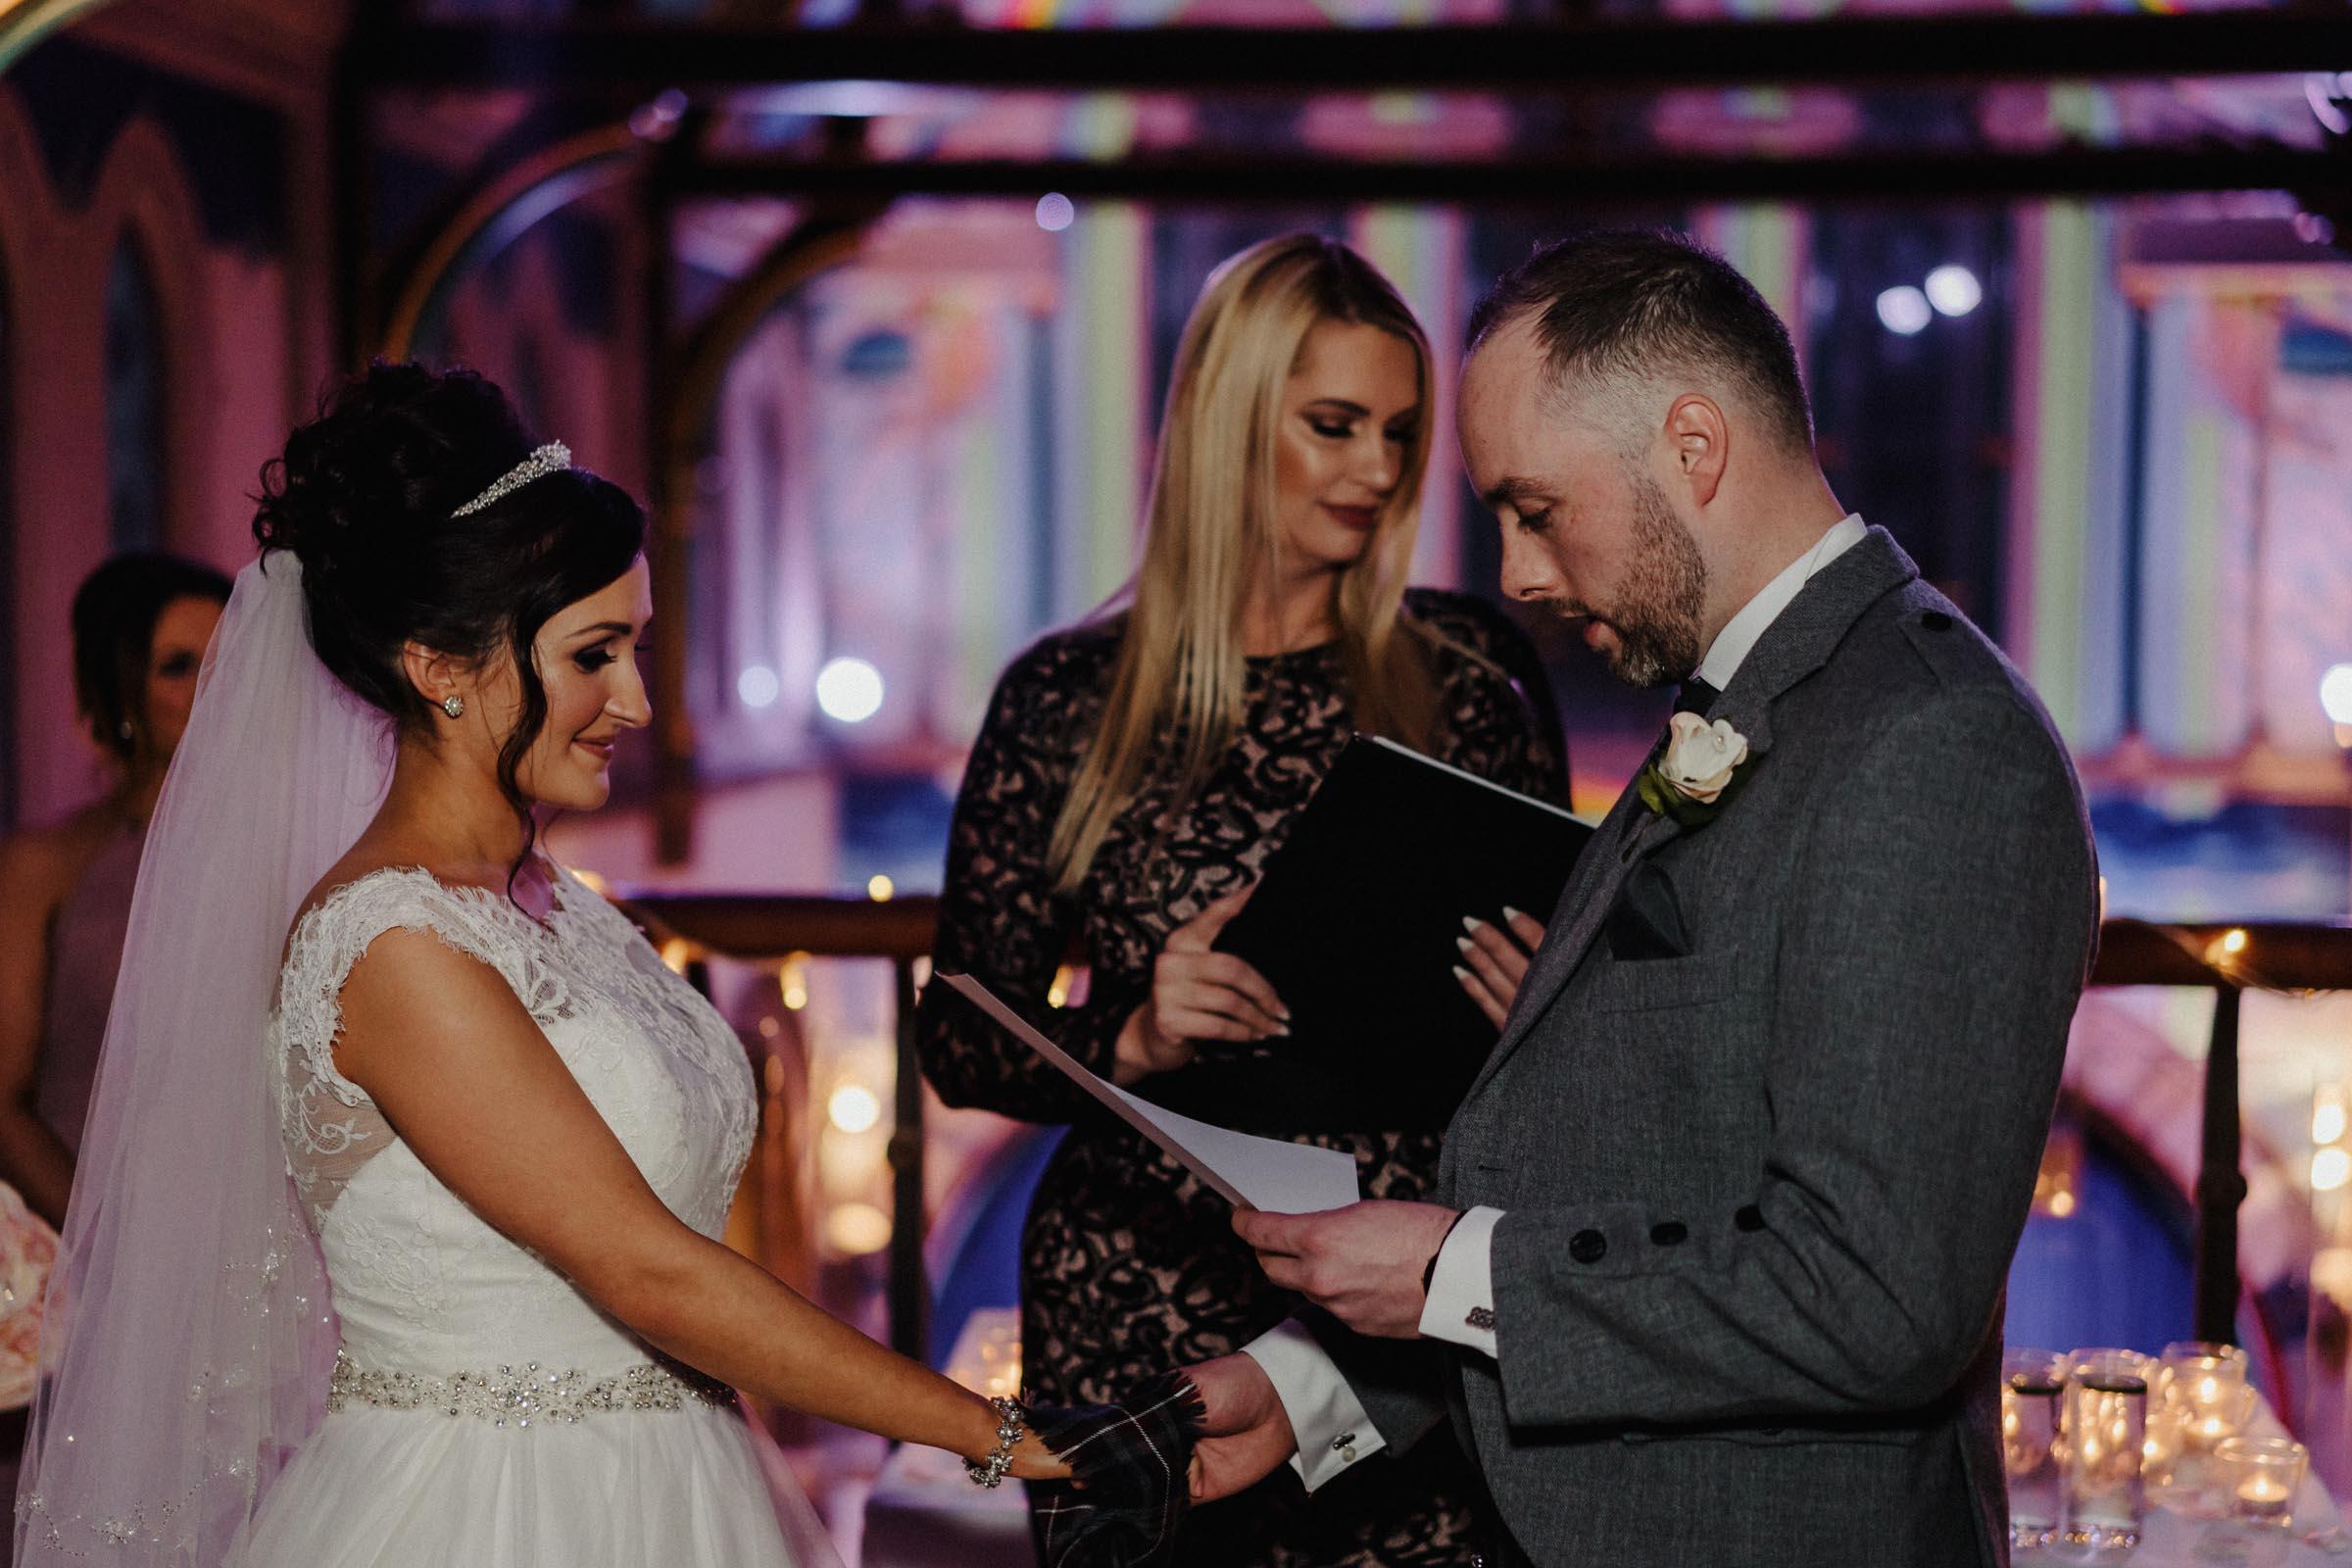 Oran-Mor-Wedding-Photographer-DearlyPhotography (20 of 55).jpg